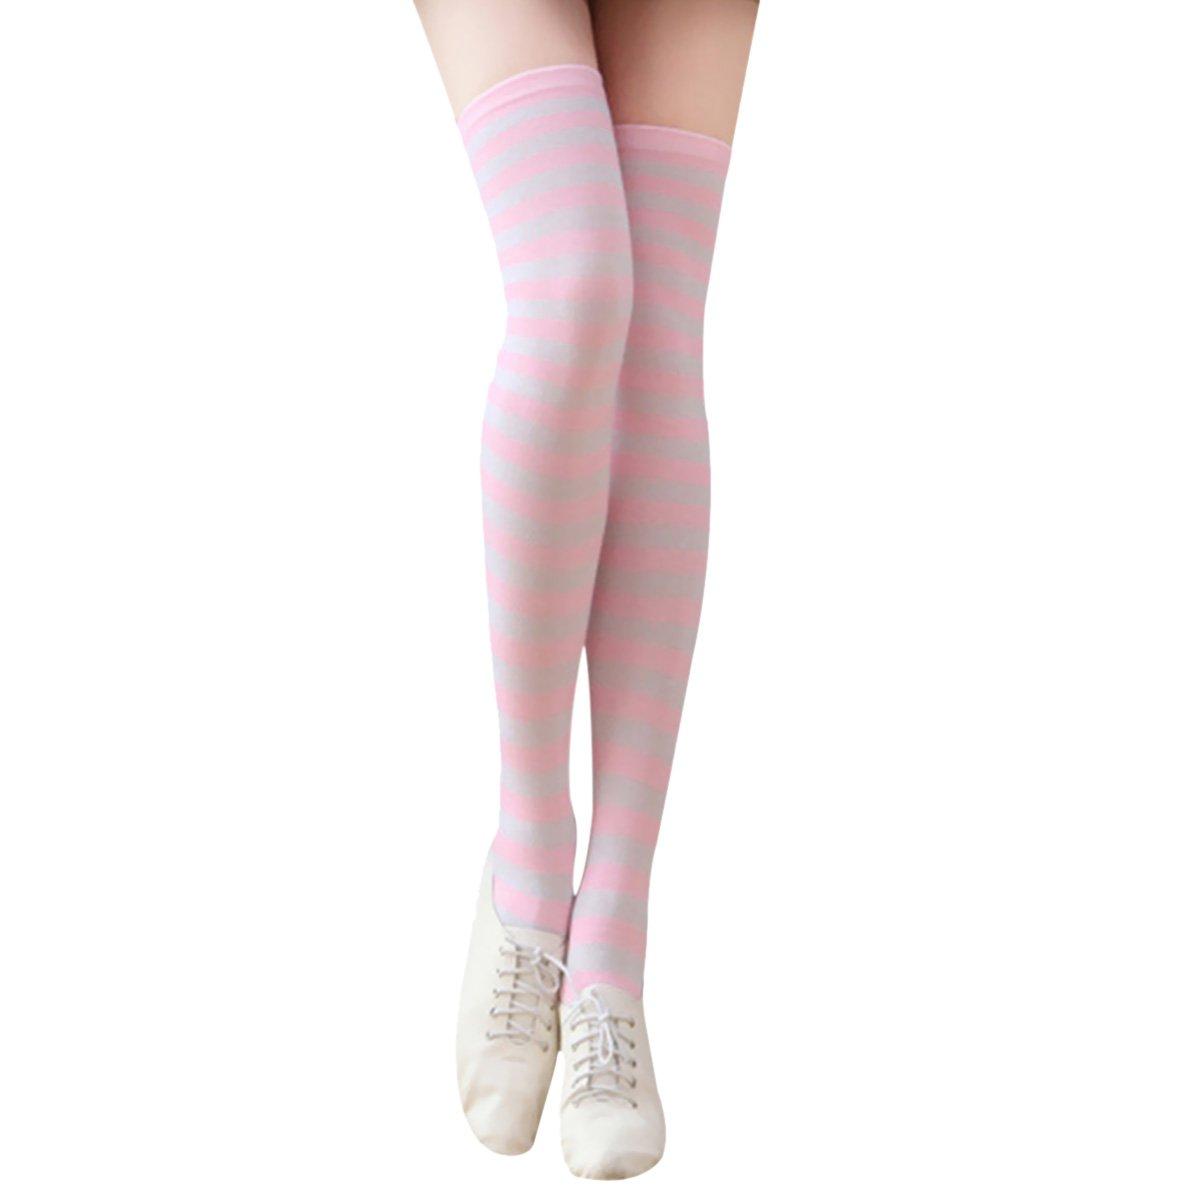 Sasairy Mädchen Herbst Winter Wärmer Streifen Overknee Strümpfe Klassik Strumpfhose Socken Lang für Halloween Party/Karneval